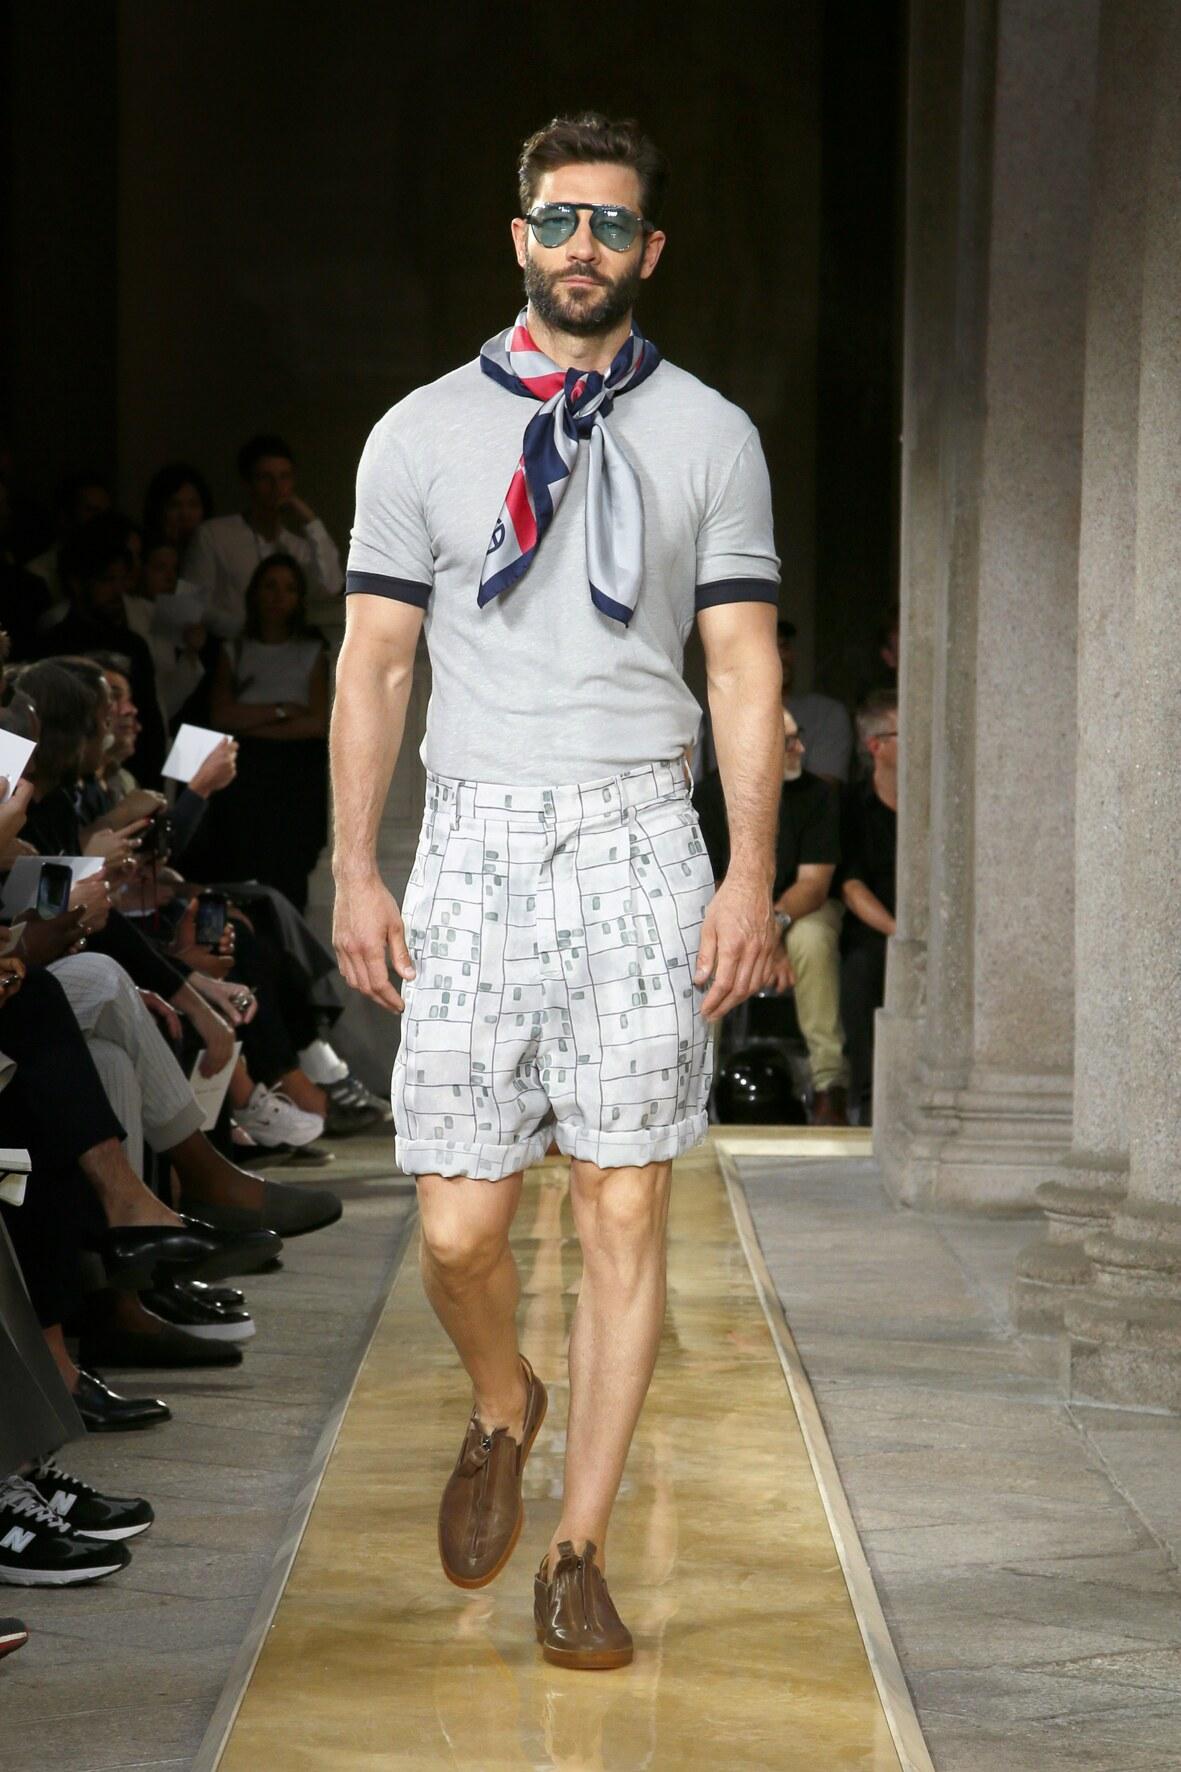 Man SS 2020 Giorgio Armani Show Milan Fashion